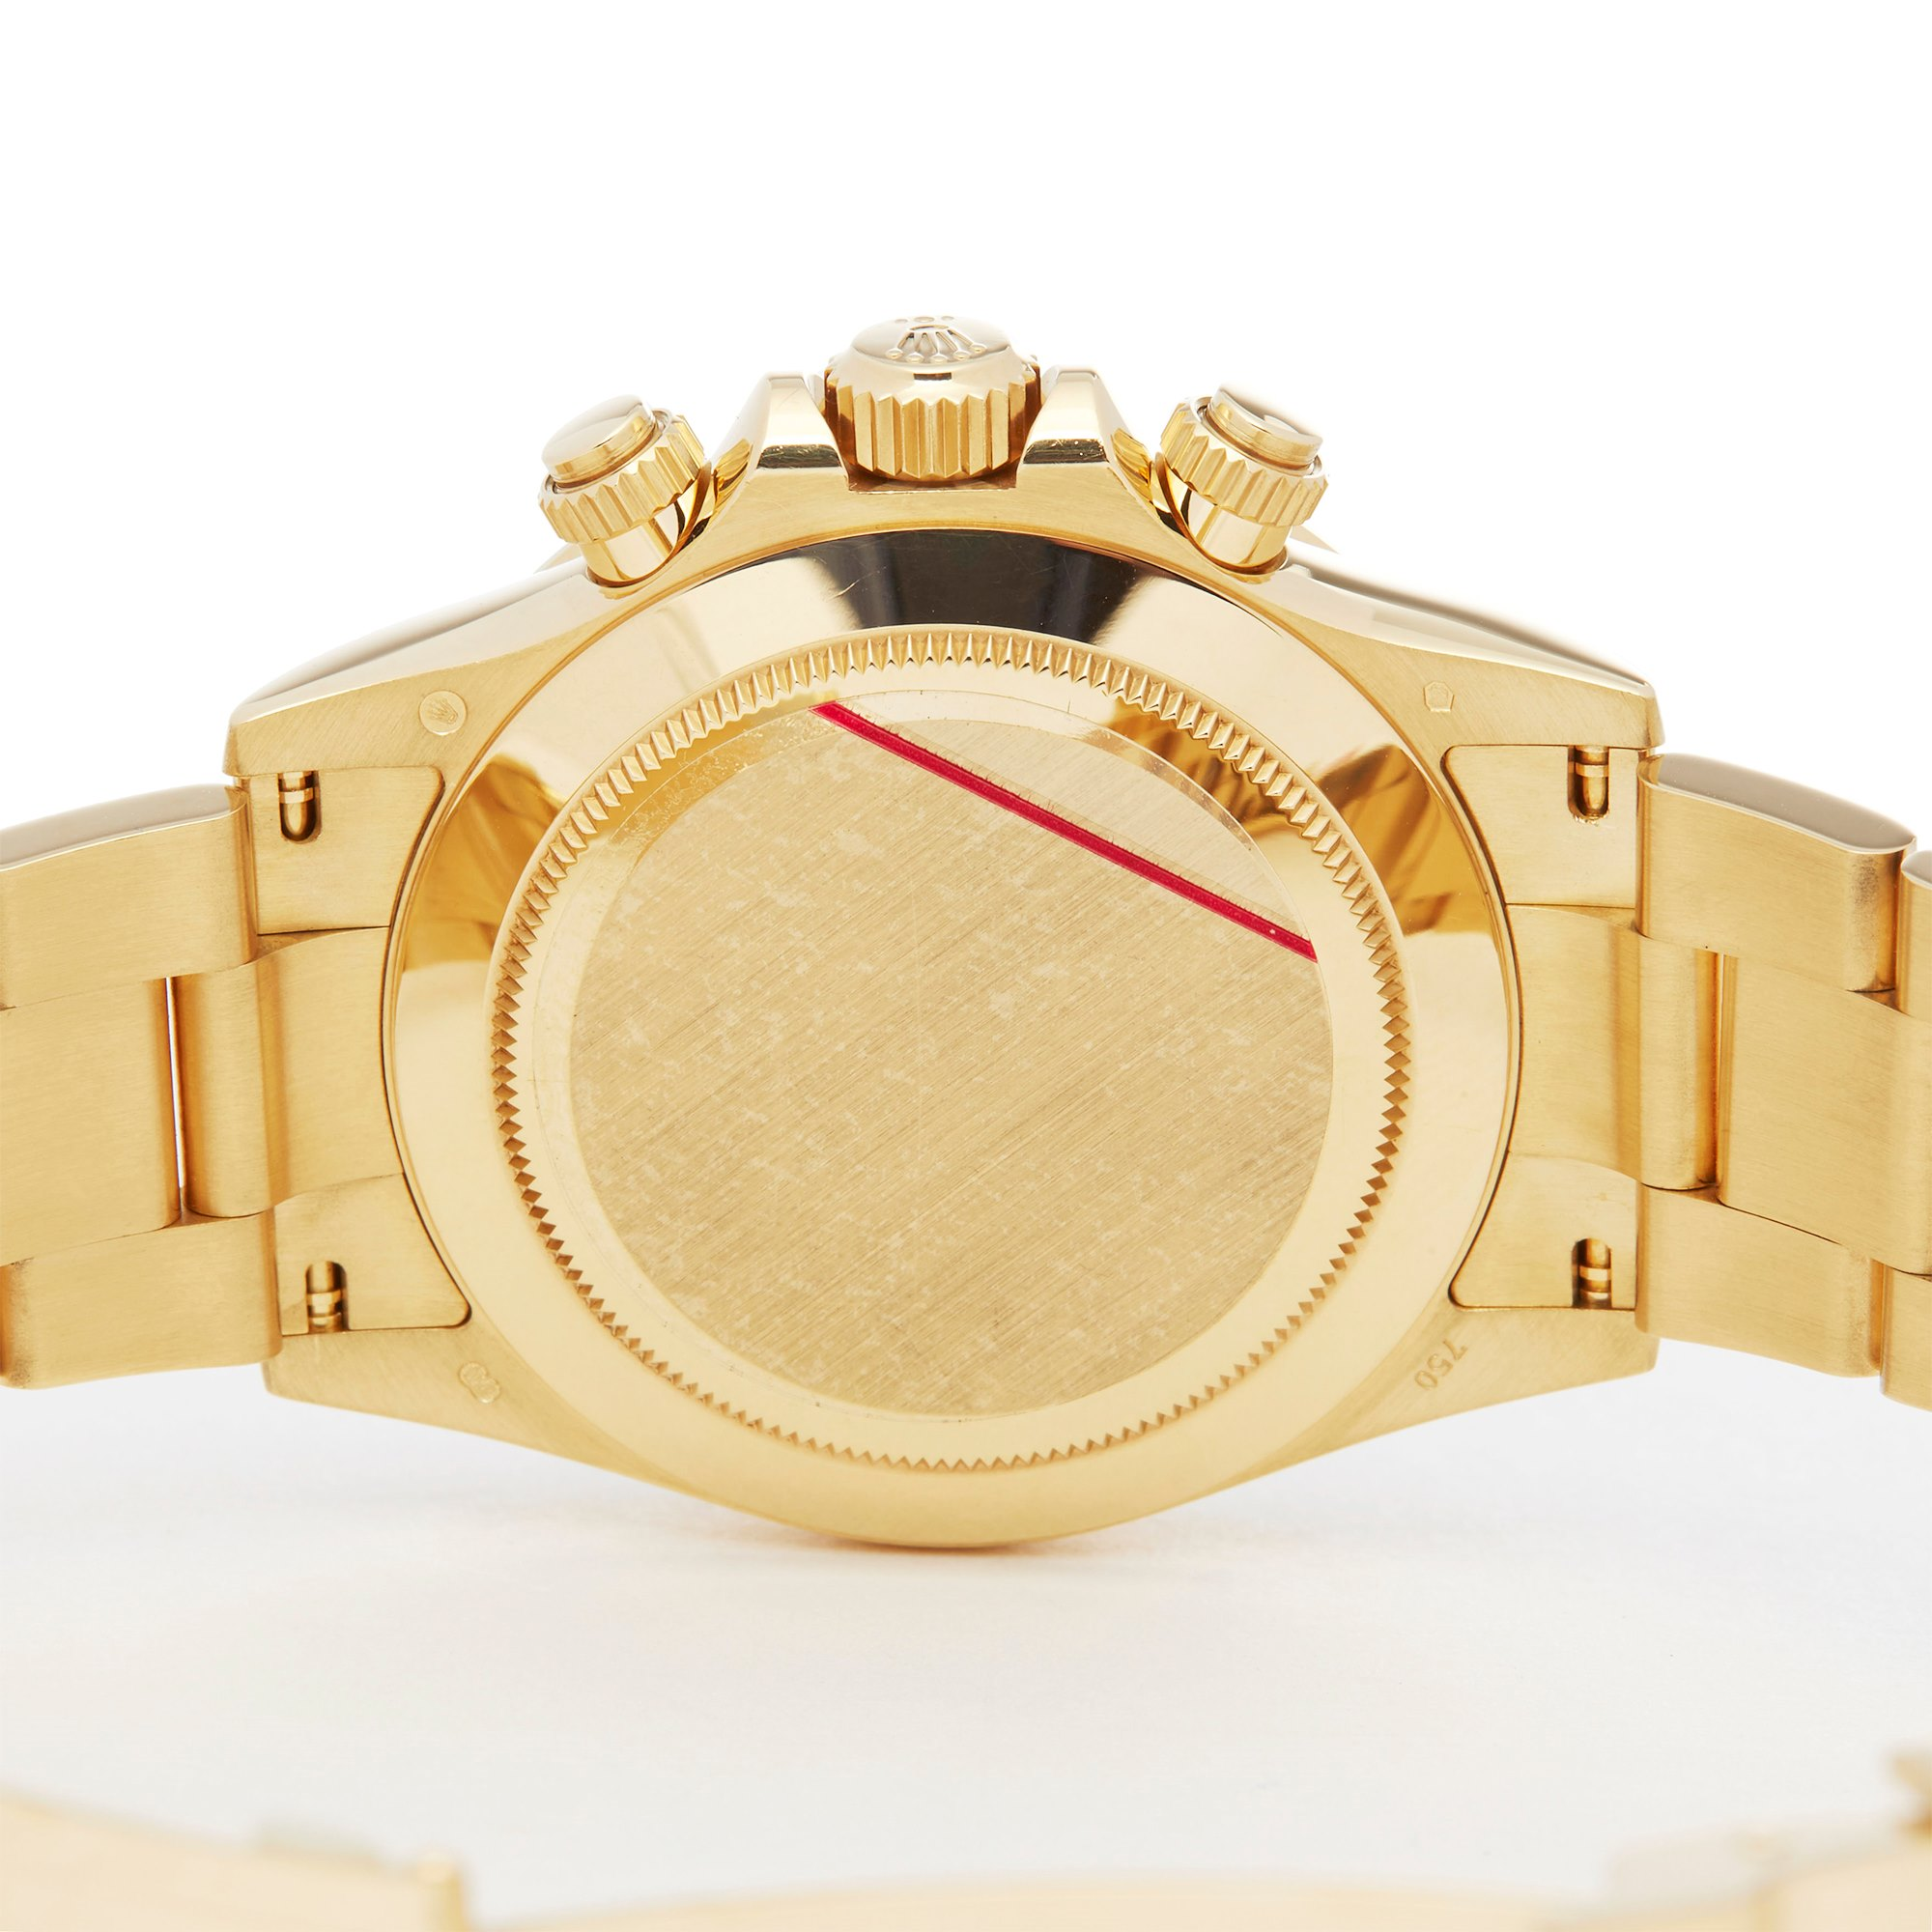 Rolex Daytona Chronograph 18K Geel Goud 116508